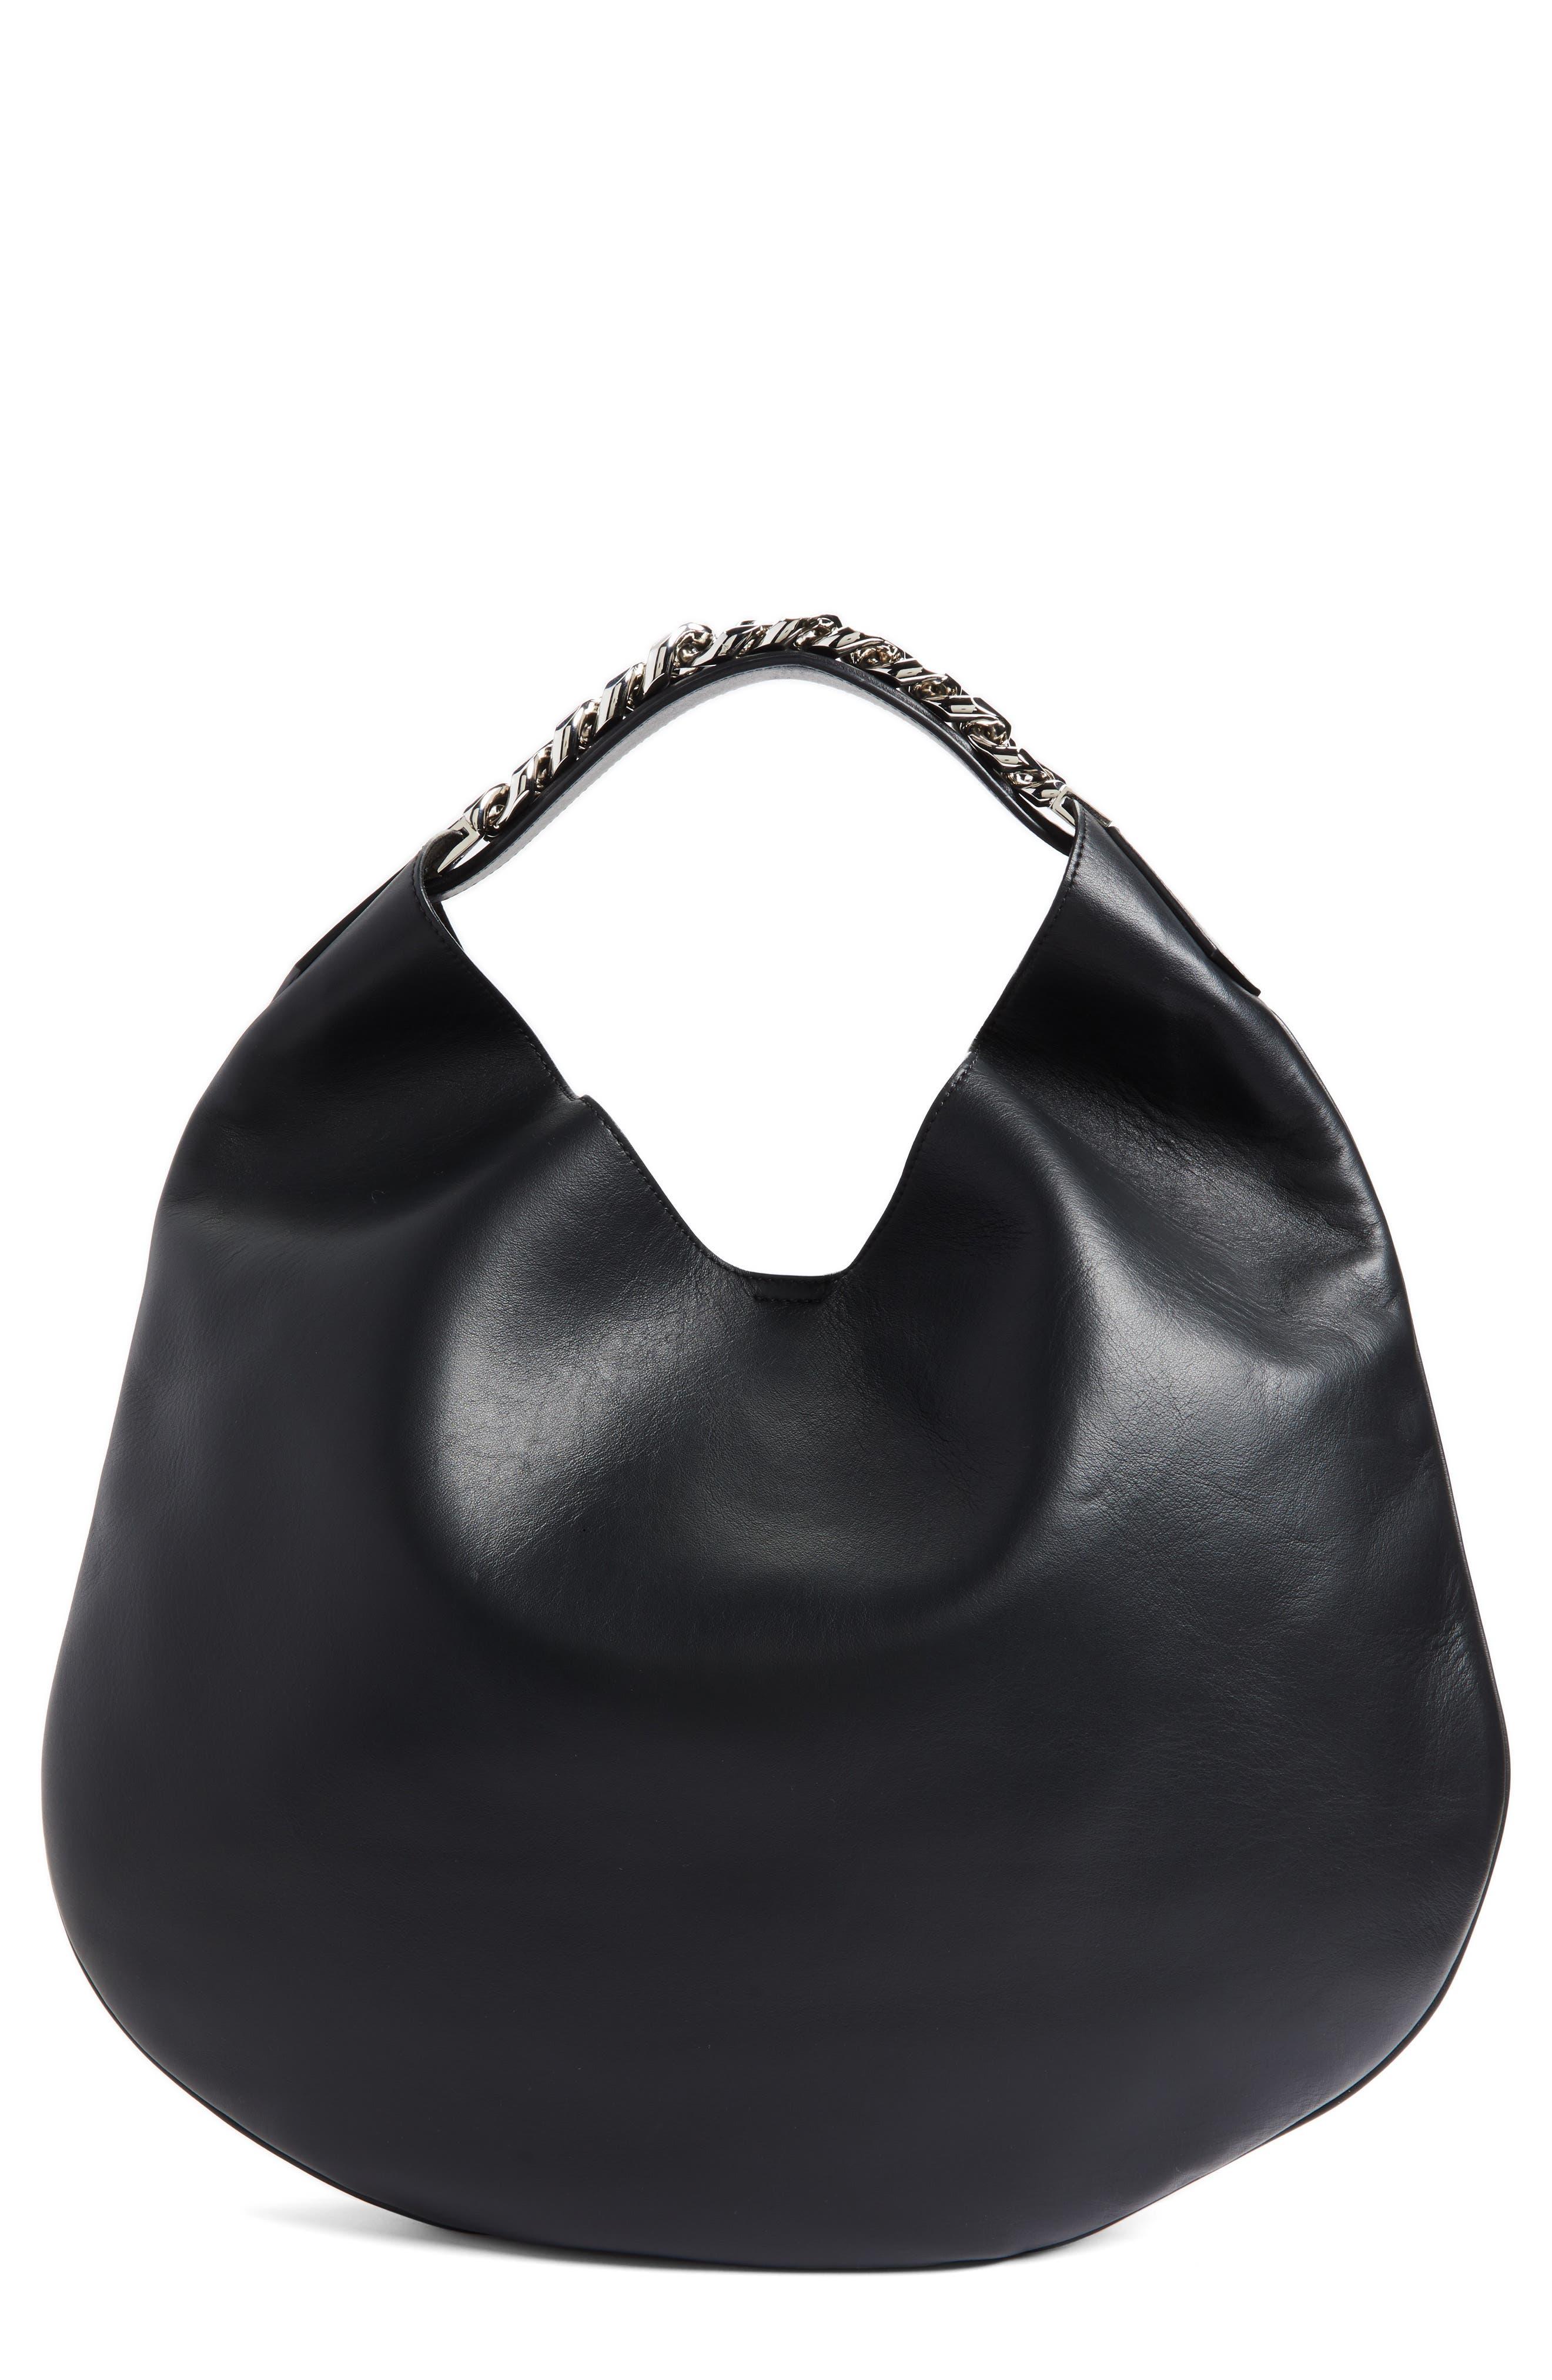 Alternate Image 1 Selected - Givenchy Medium Infinity Calfskin Leather Hobo